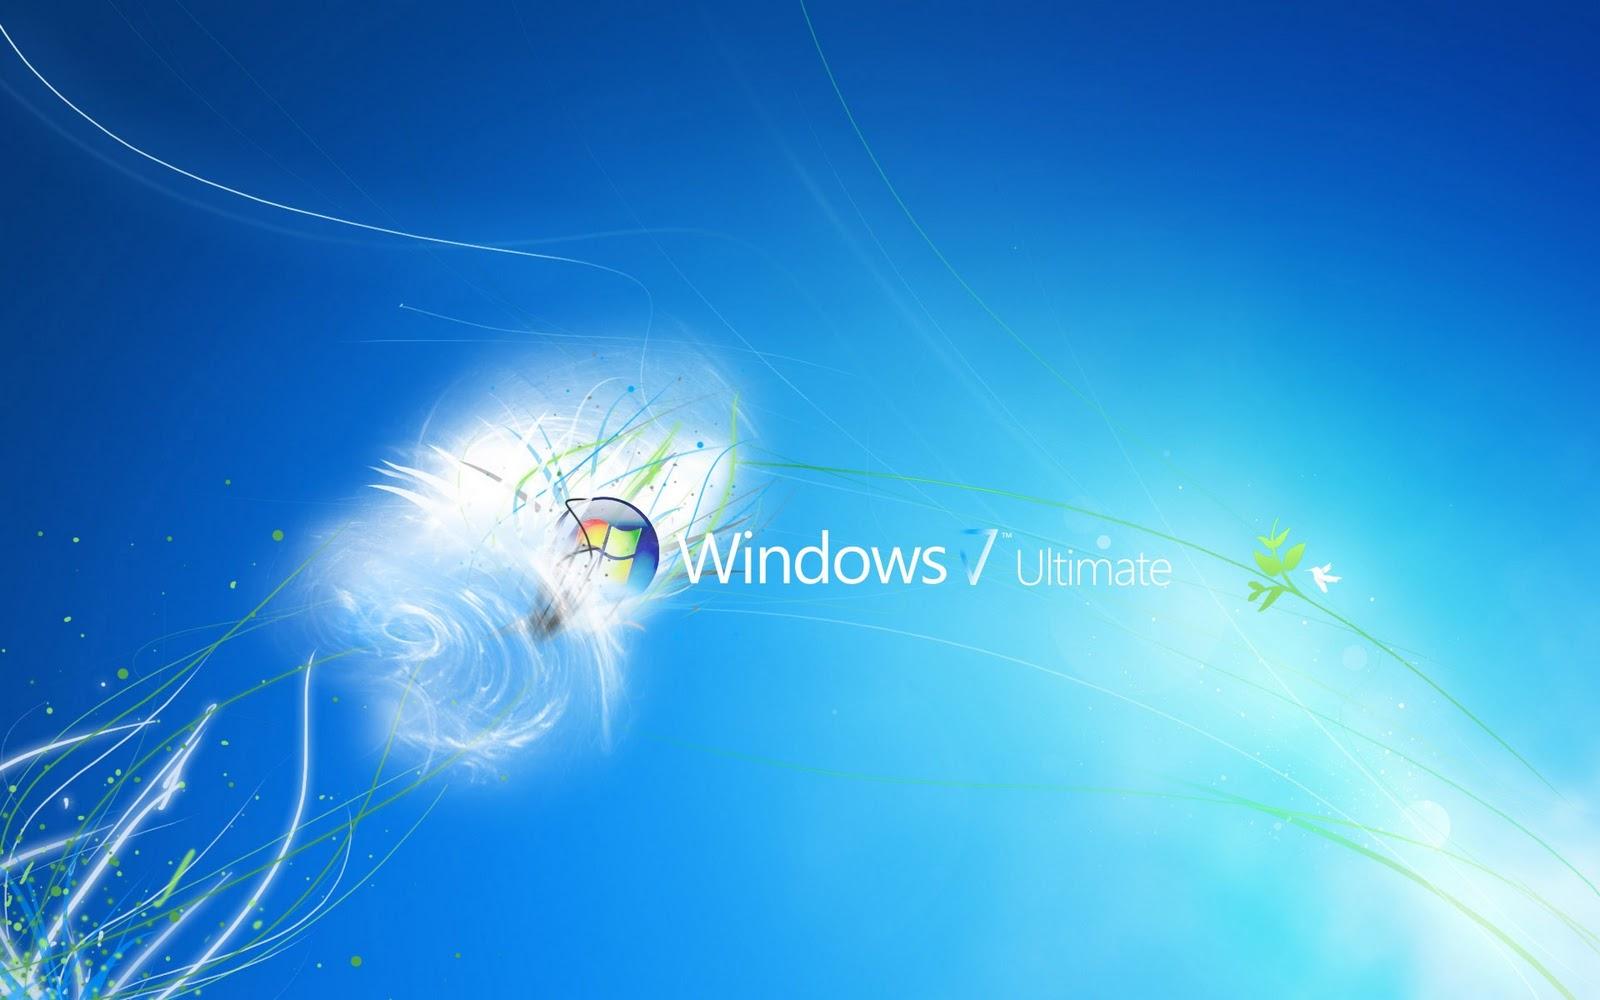 Windows 7 achtergronden windows 7 wallpapers 15jpg 1600x1000